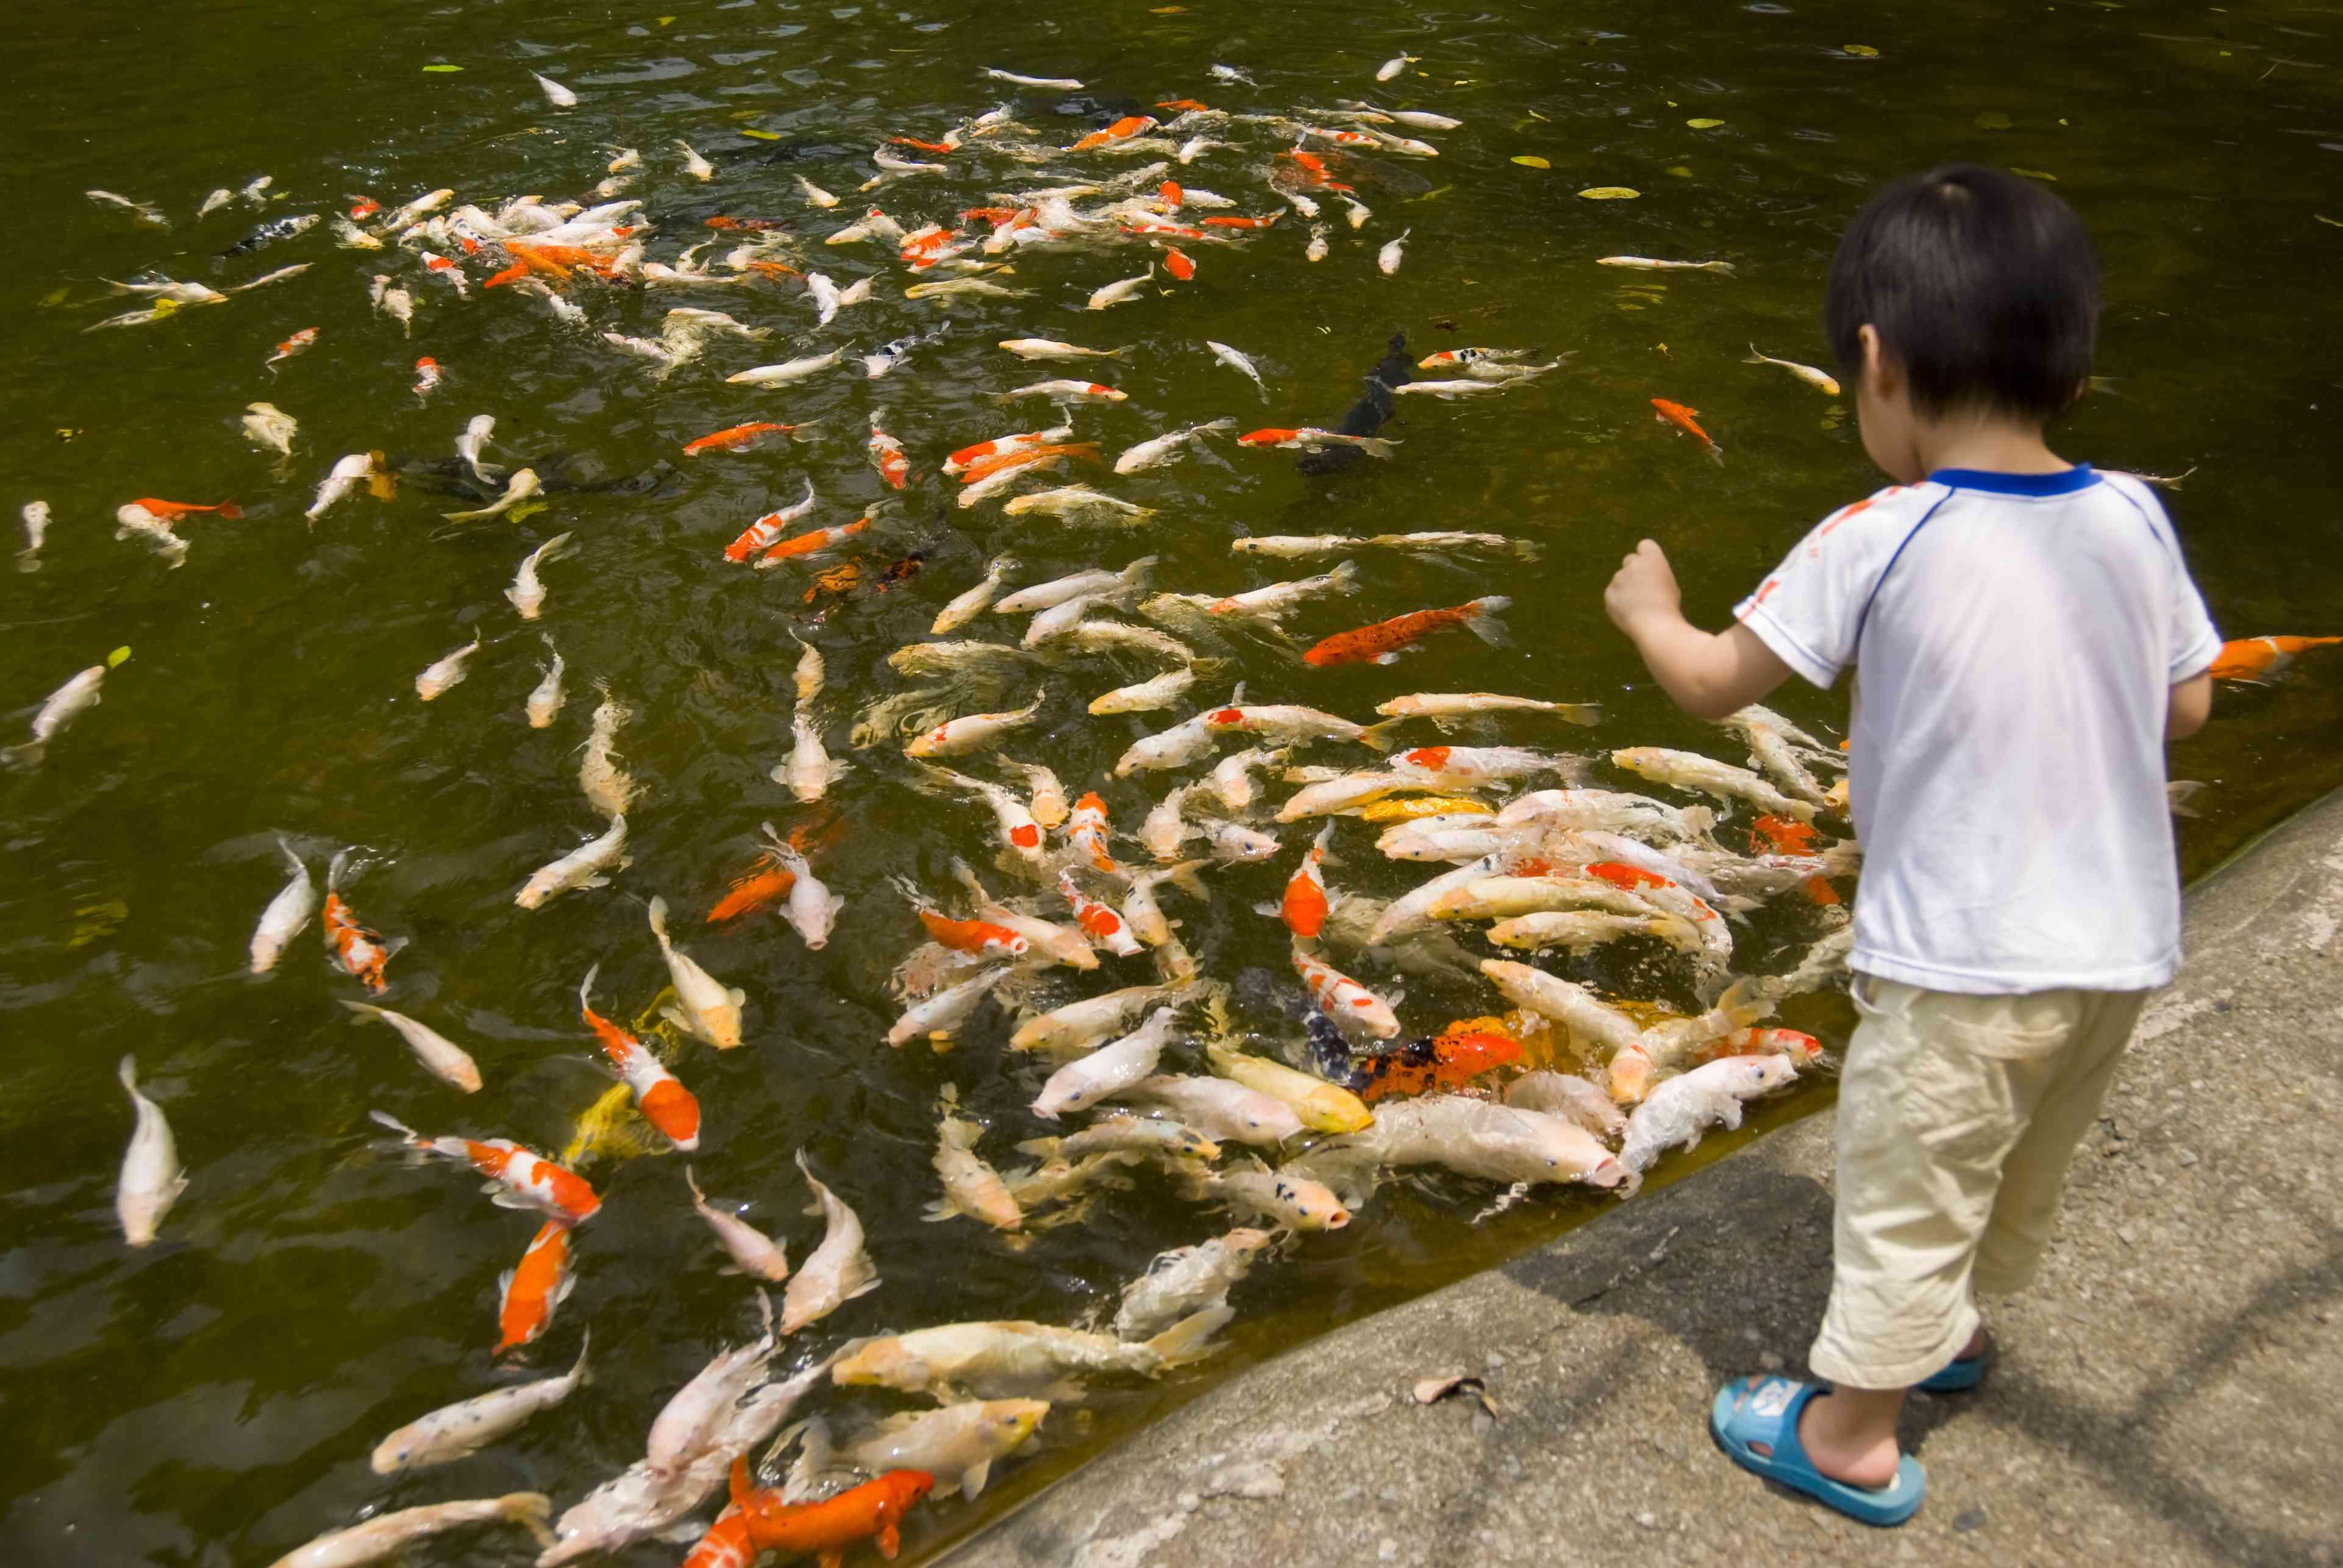 A child feeding koi fish.